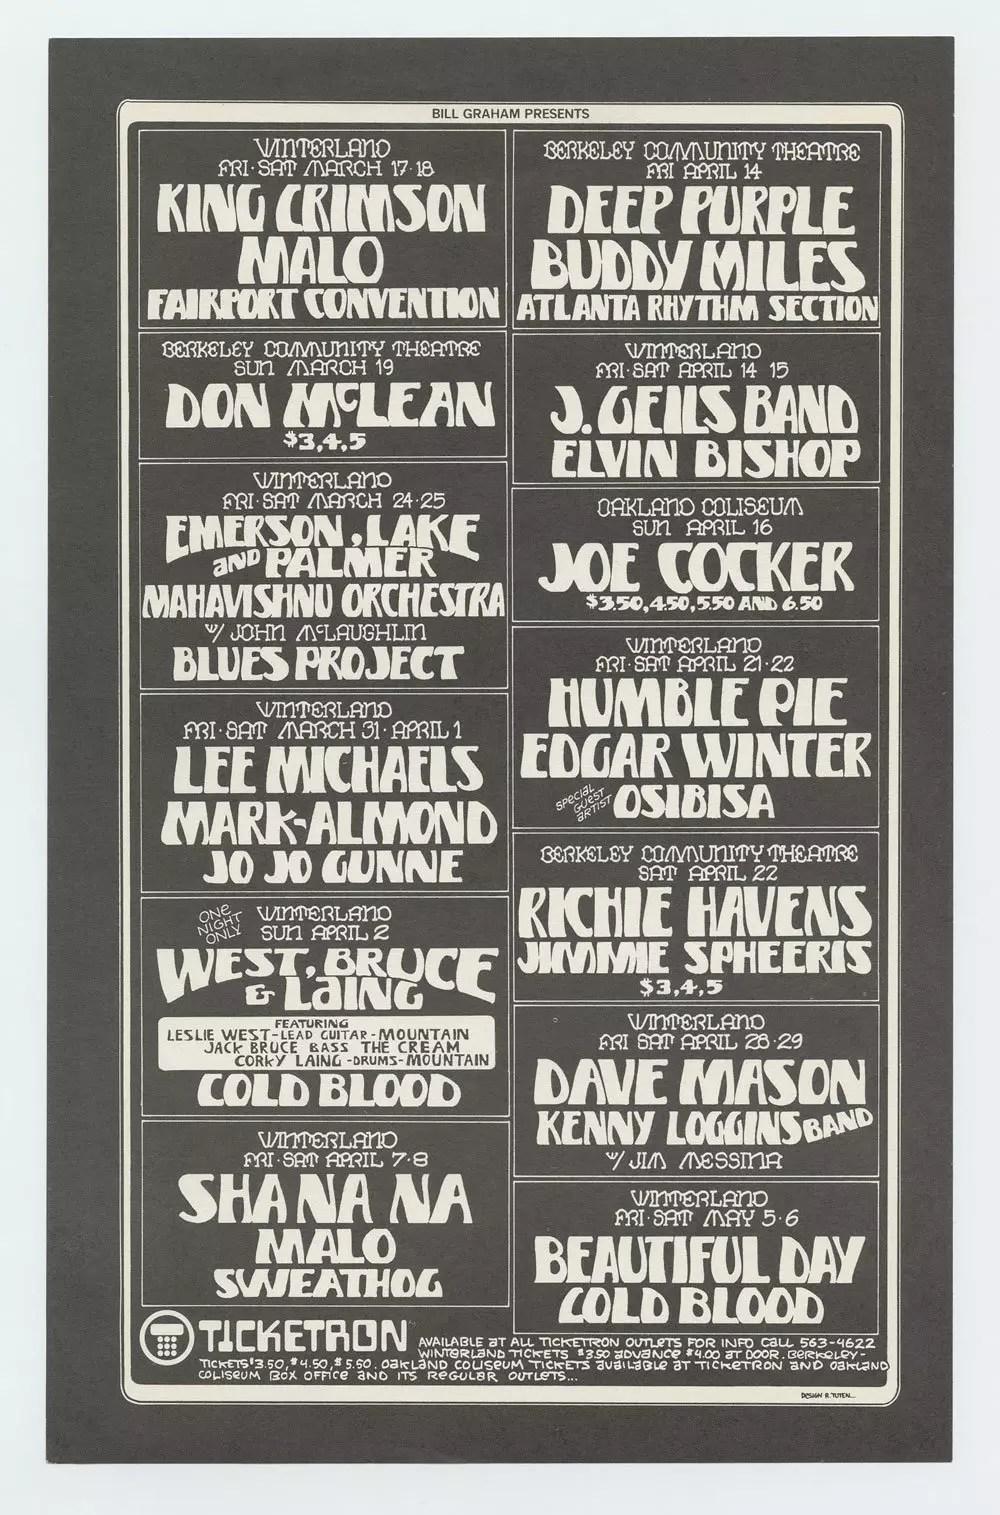 Bill Graham Presents Flyer 1972 Mar thru May King Crimson Buddy Miles